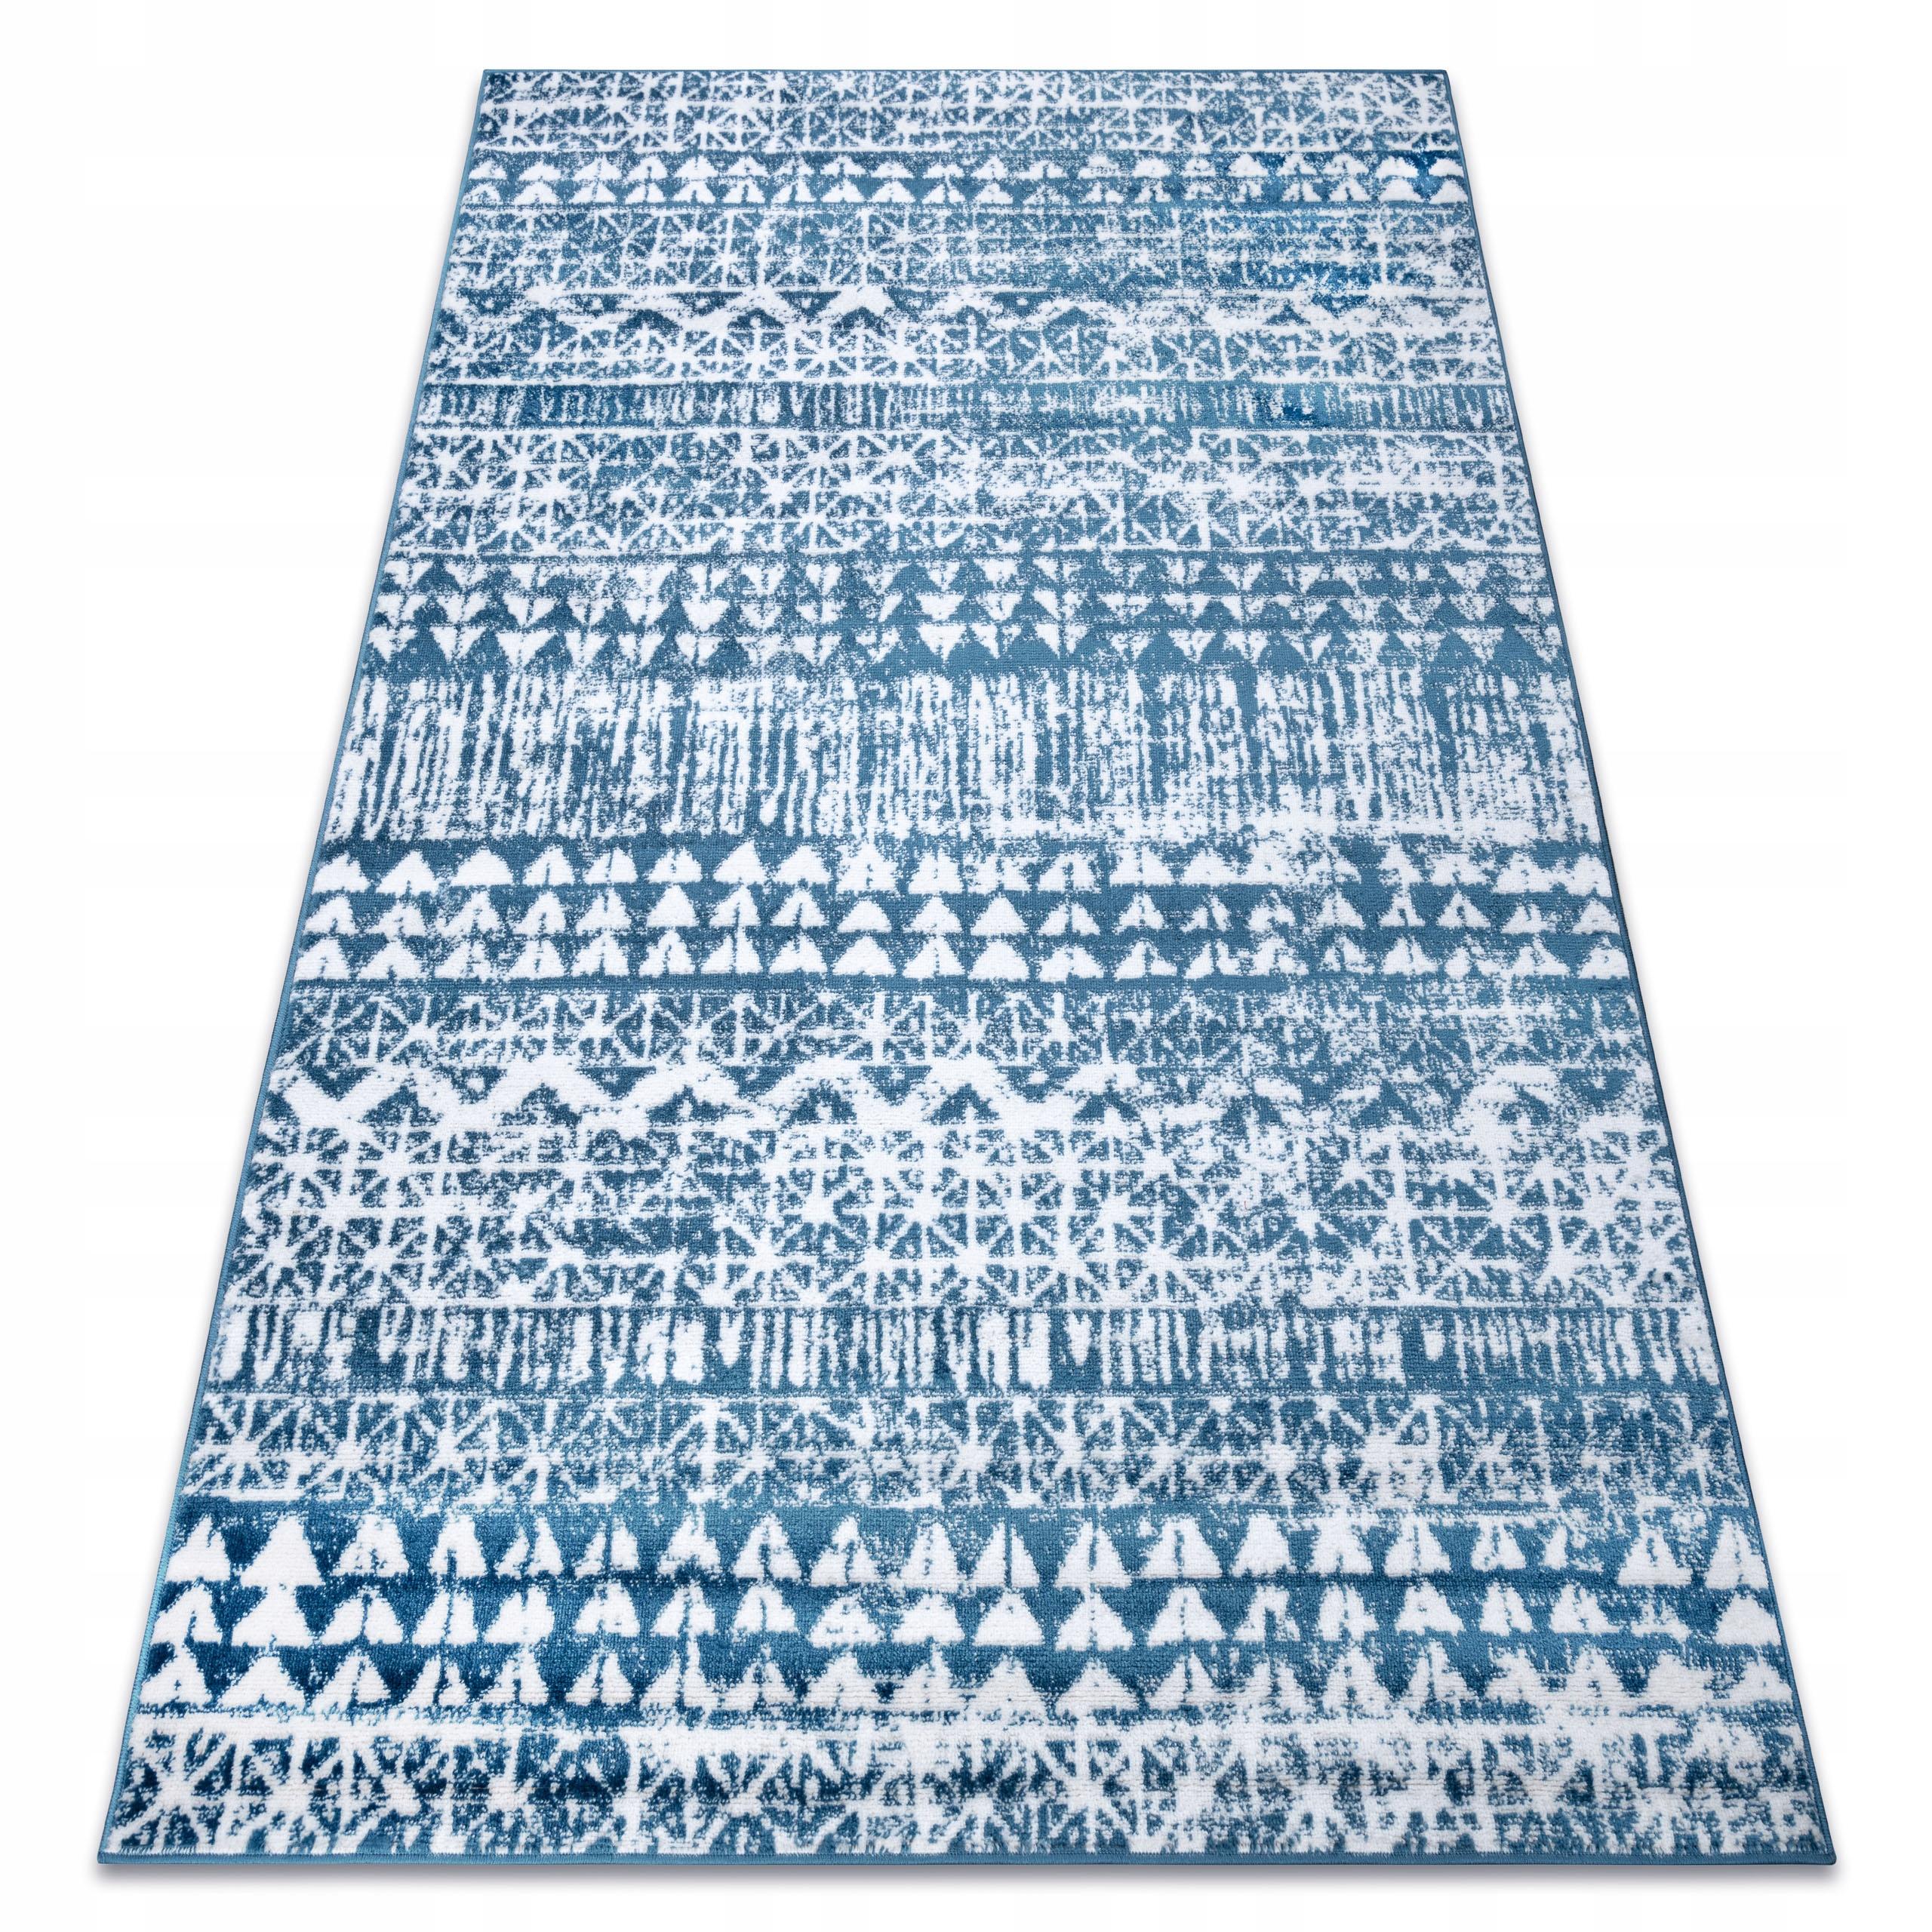 RETRO KOBEREC 120x170 cm VINTAGE blue #GR3356